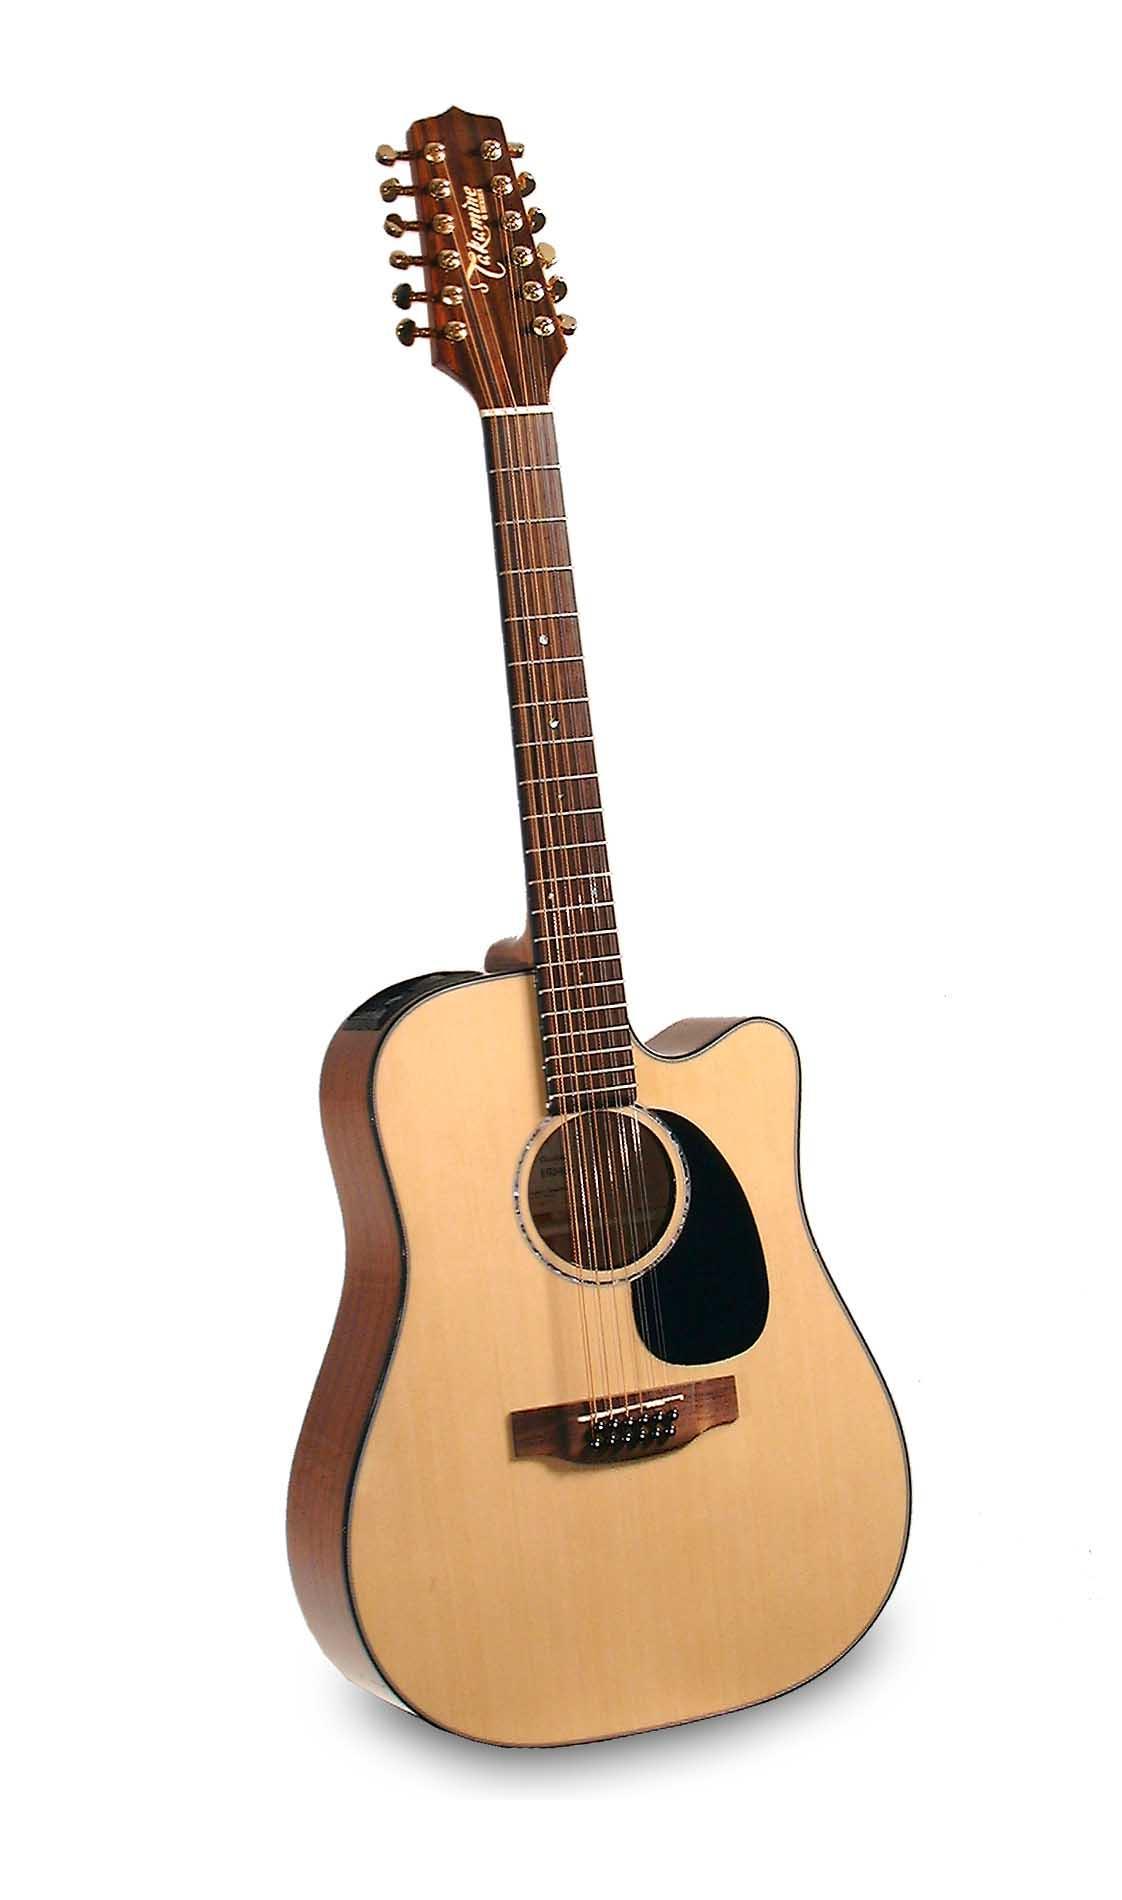 Takamine Eg345c Guitar Gloss Natural